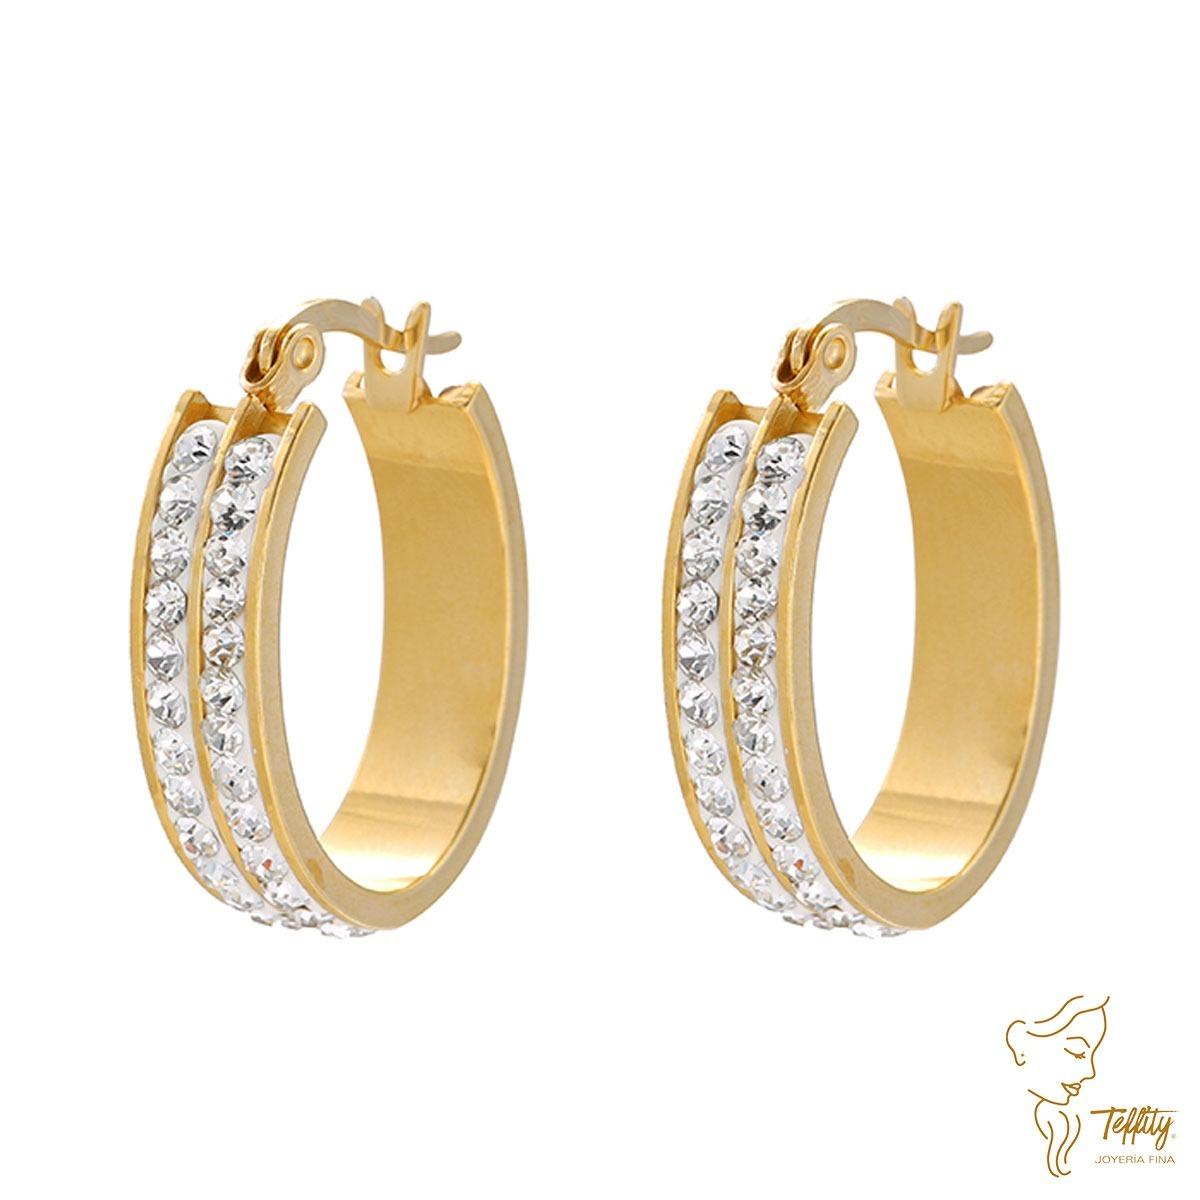 71b60650106a arete oro laminado 24k fashion piedra diamante (mayoreo). Cargando zoom.